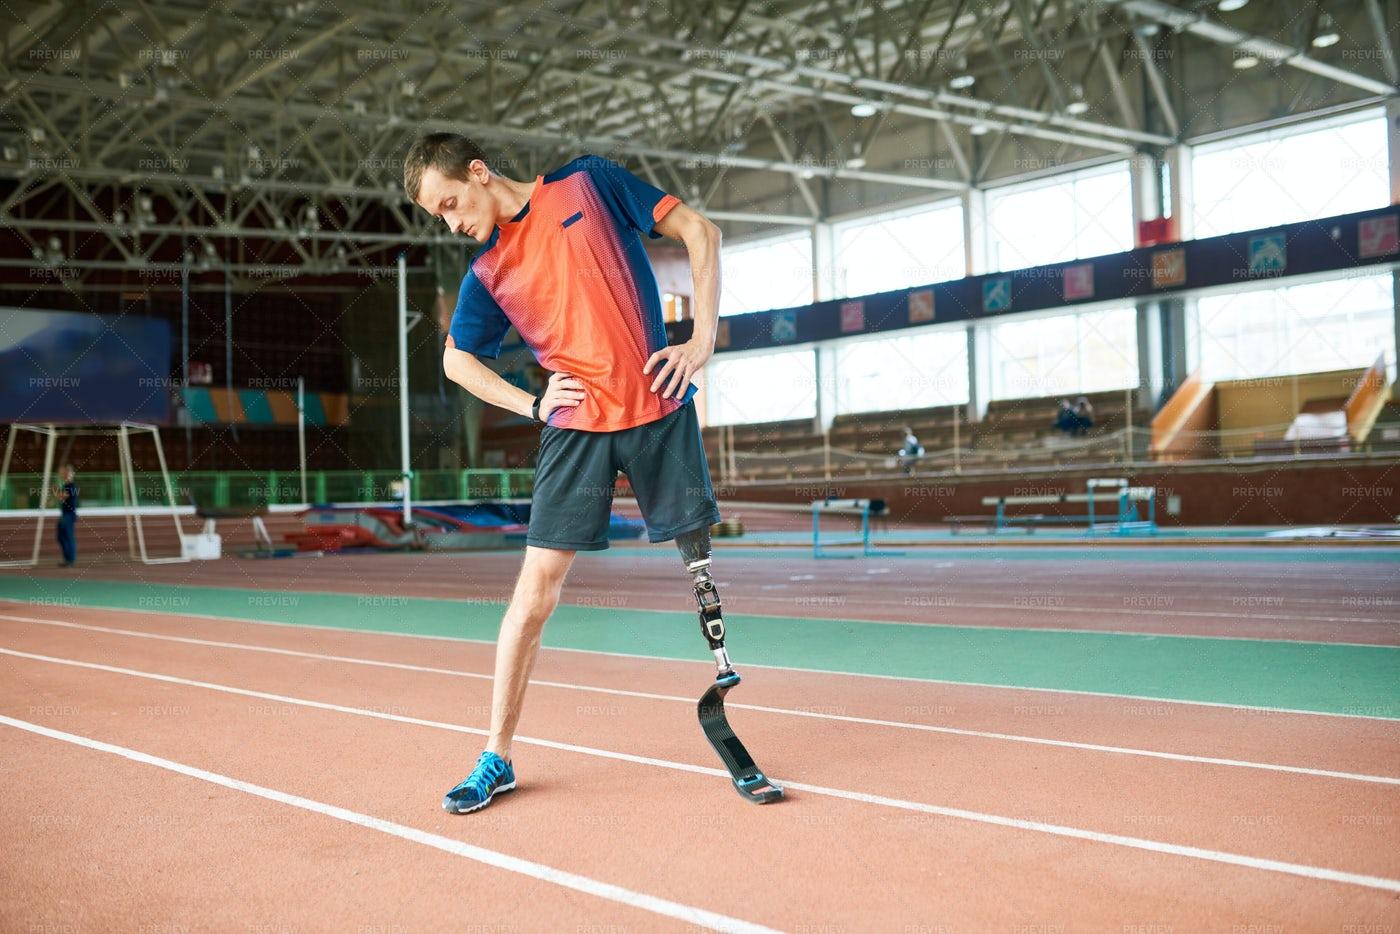 Adaptive Sportsman Warming Up: Stock Photos